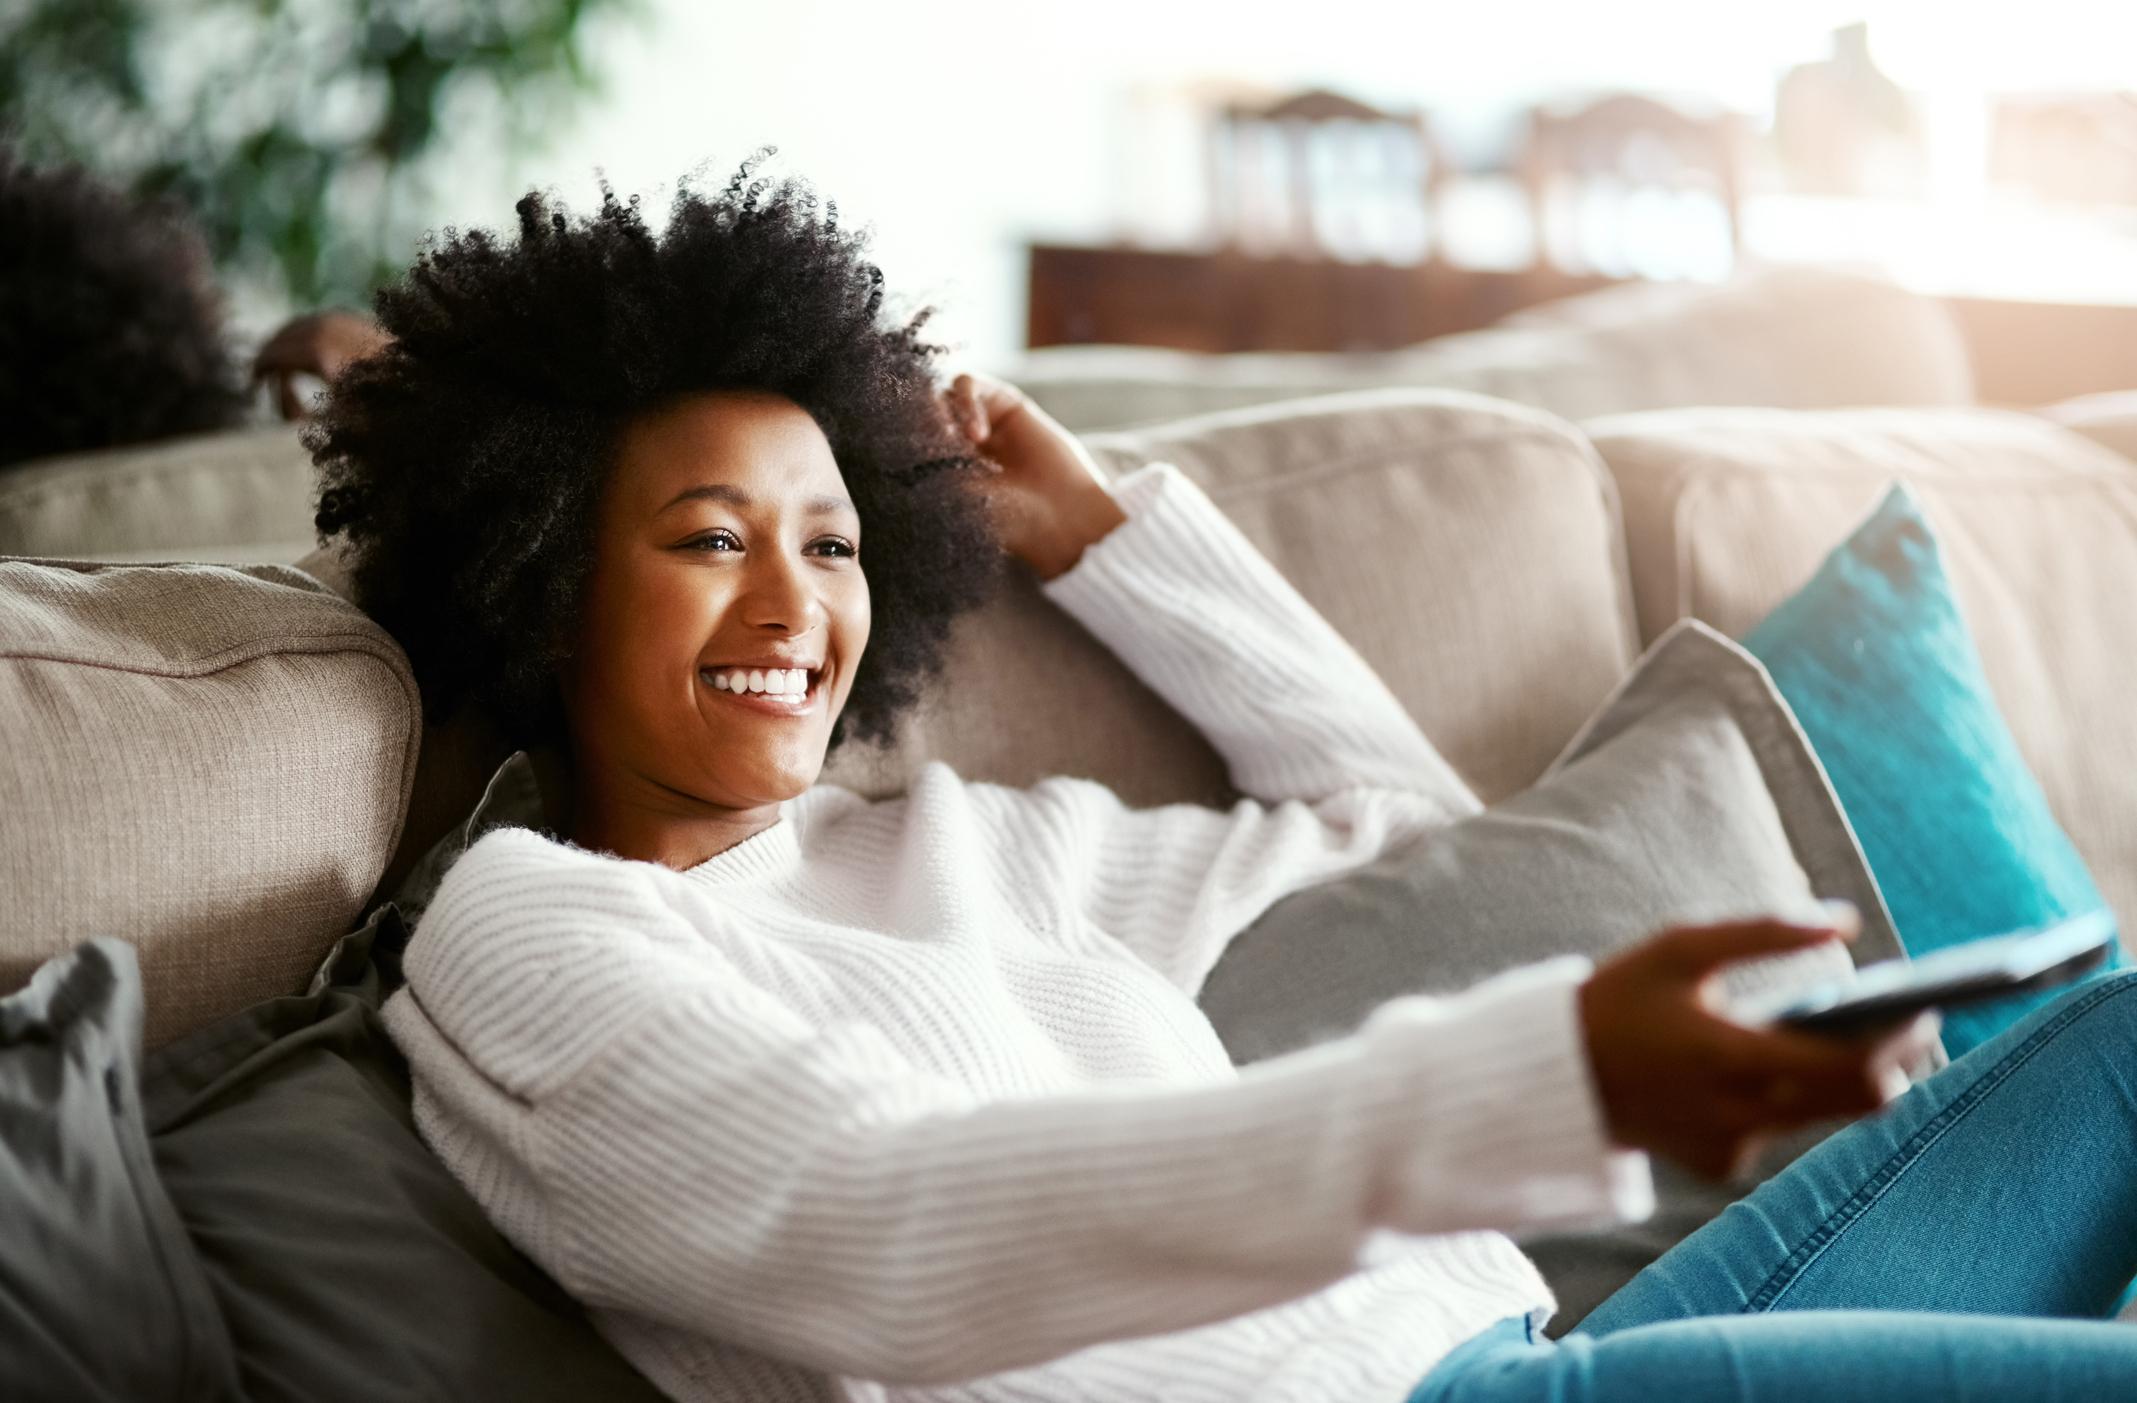 Get DISH TV with Your Satellite Internet | SatelliteInternet com